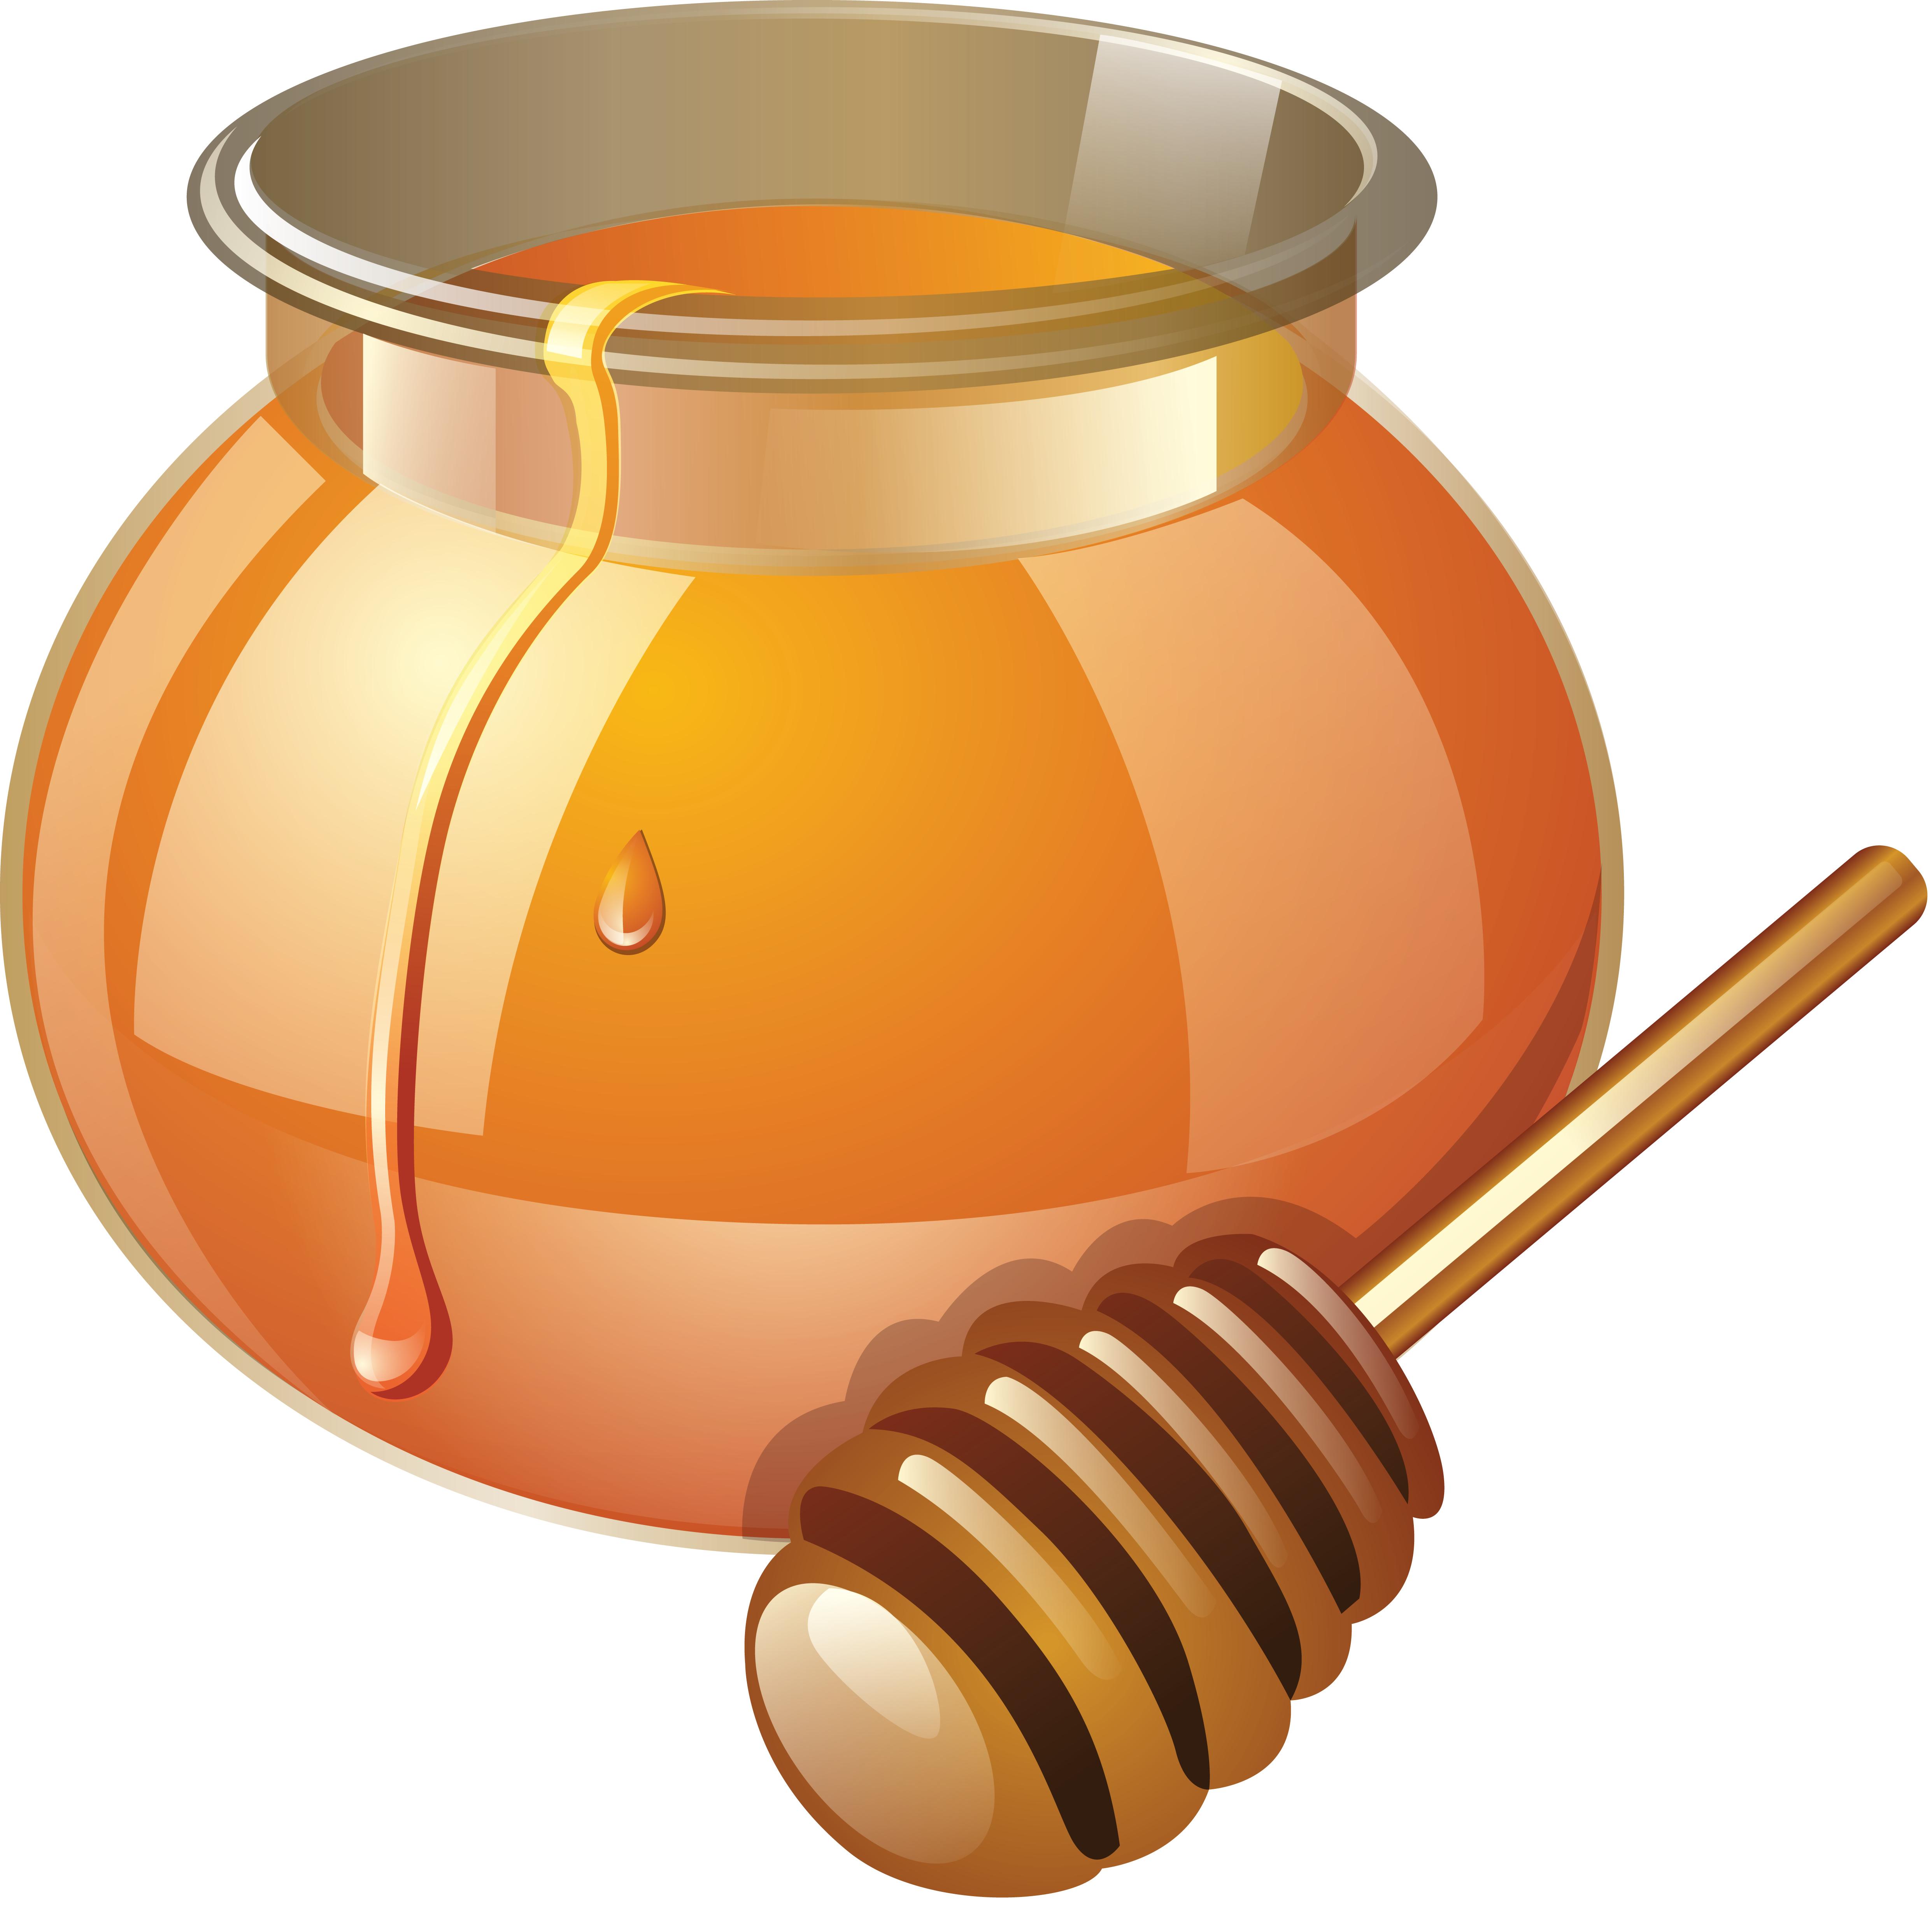 Honey Clipart Images.